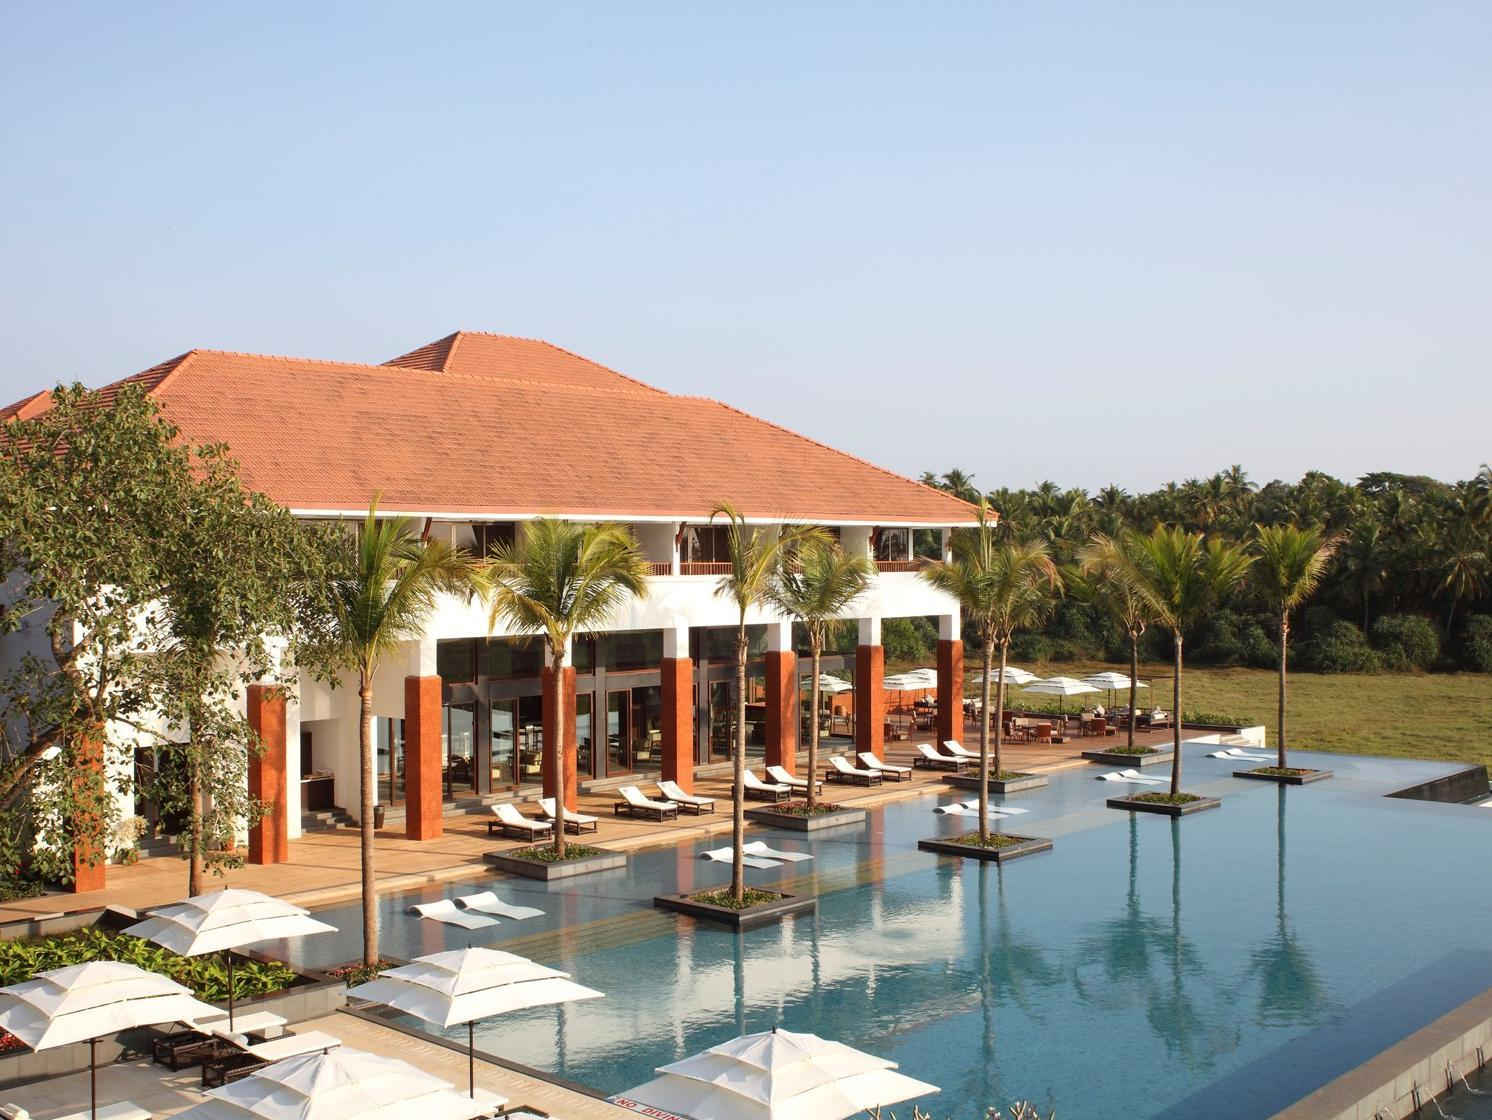 Alila Diwa Hotel - Hotell och Boende i Indien i Goa